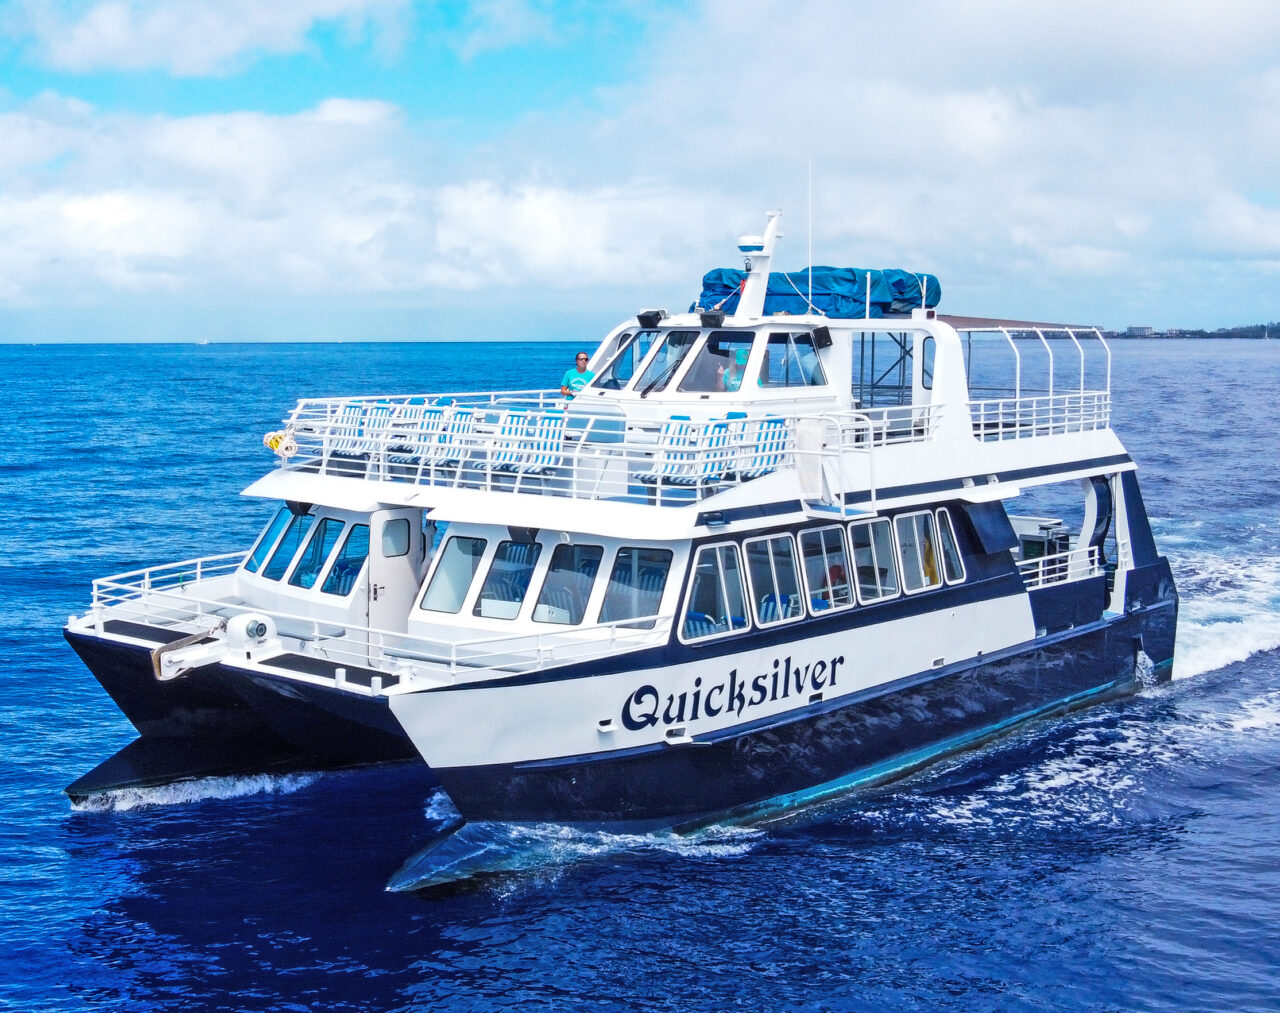 Product Lanai Snorkel Dolphin Excursion